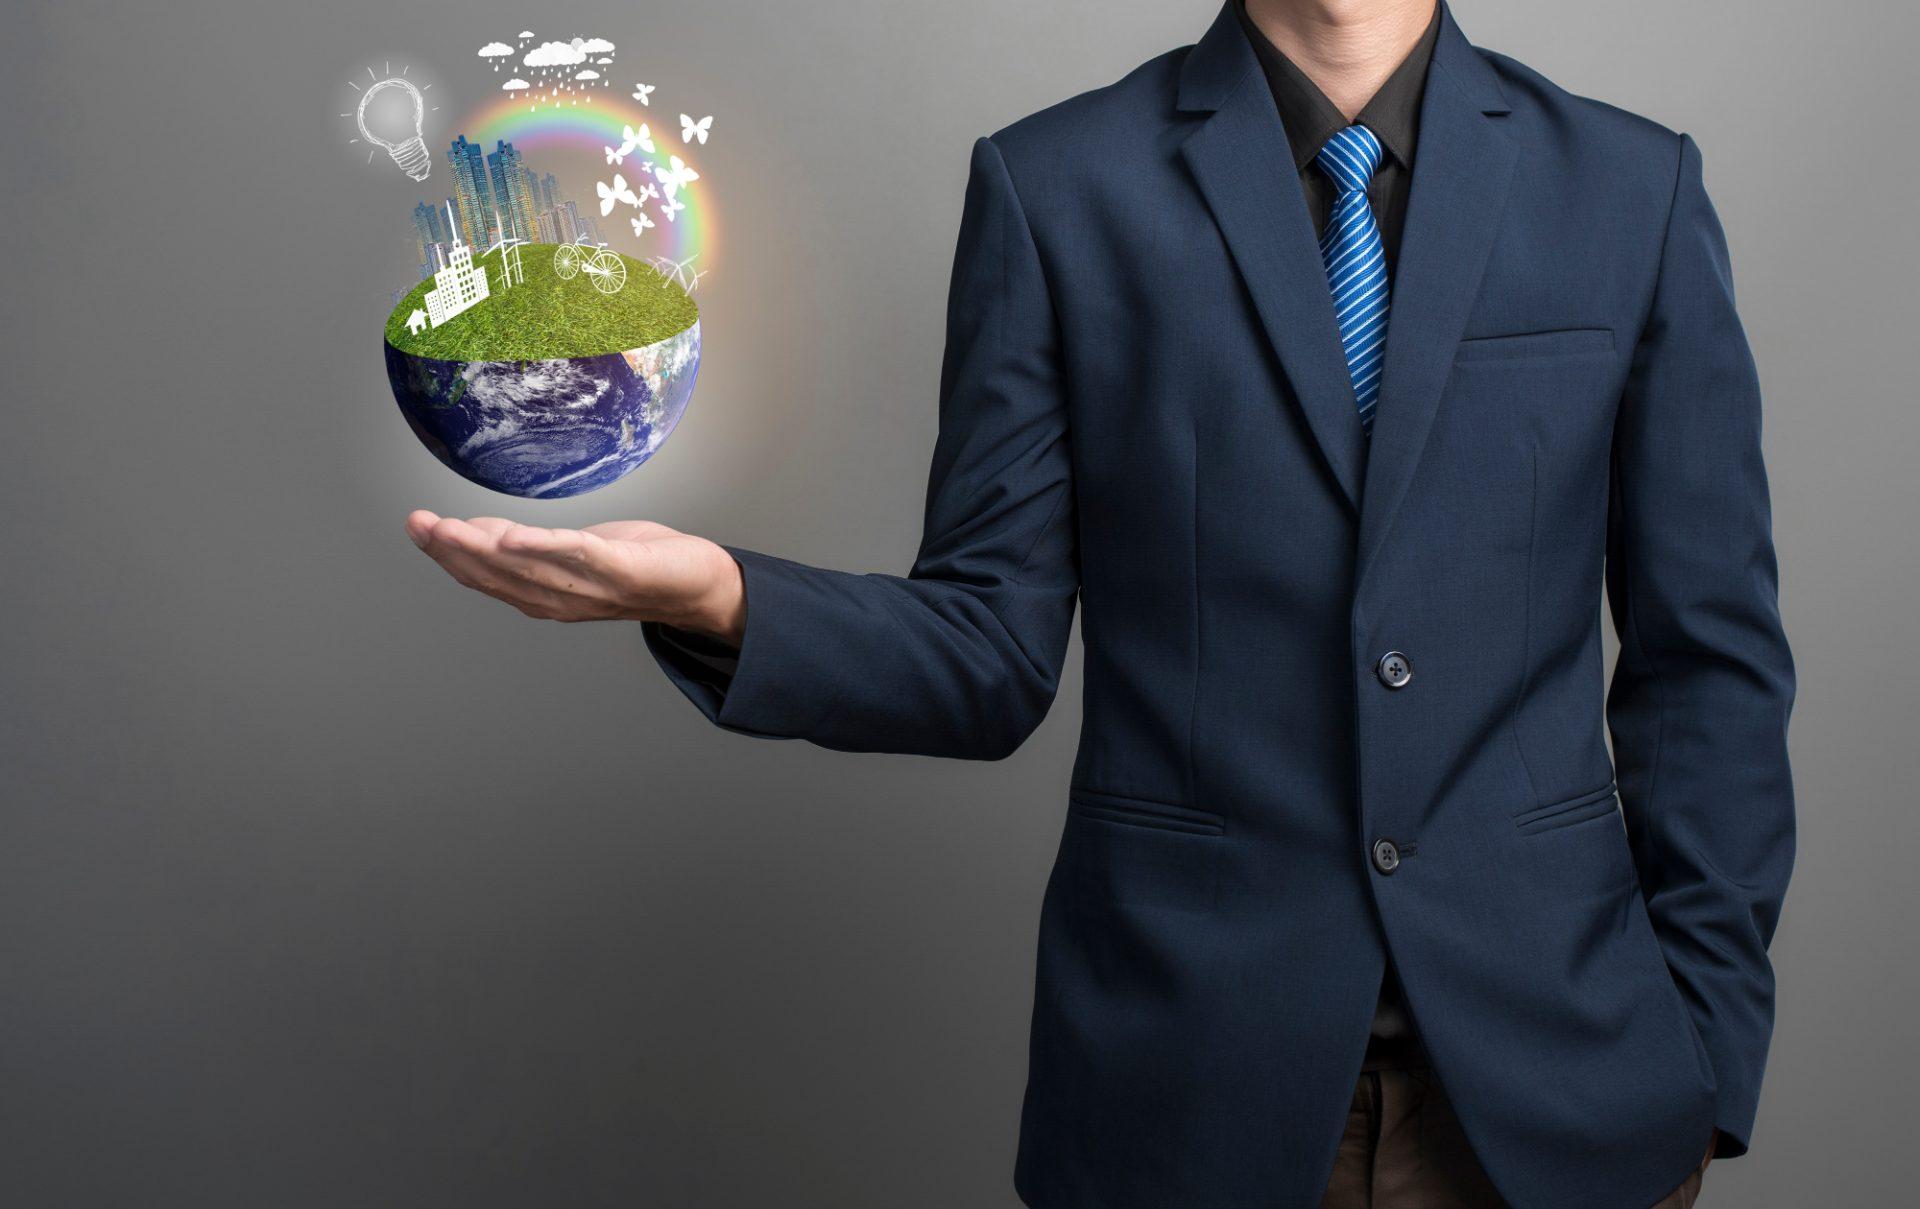 corporate-social-responsibility-rainbows-gty-img